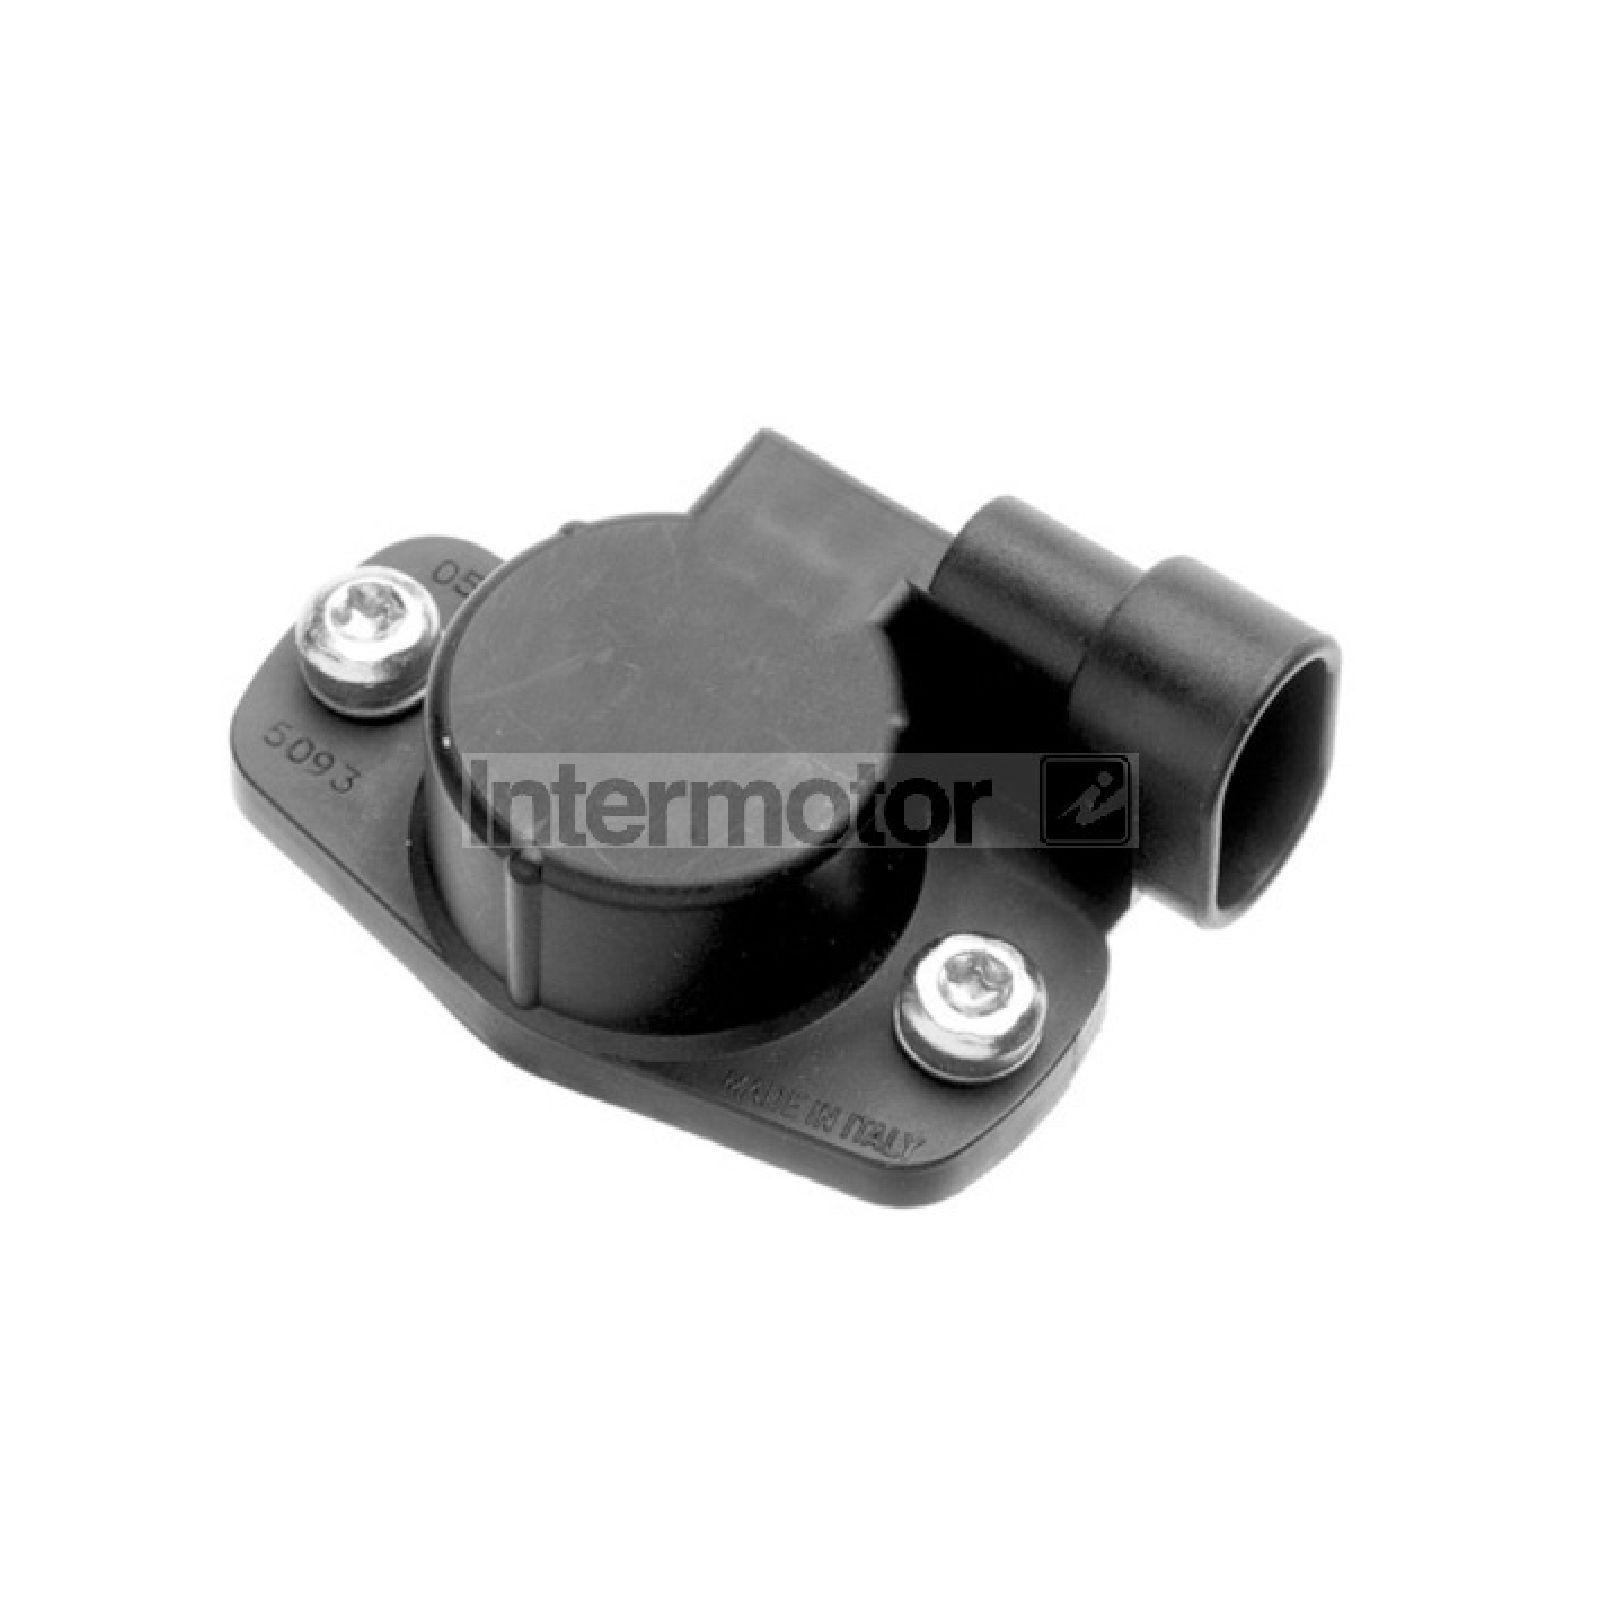 Intermotor throttle position sensor tps accelerator pedal